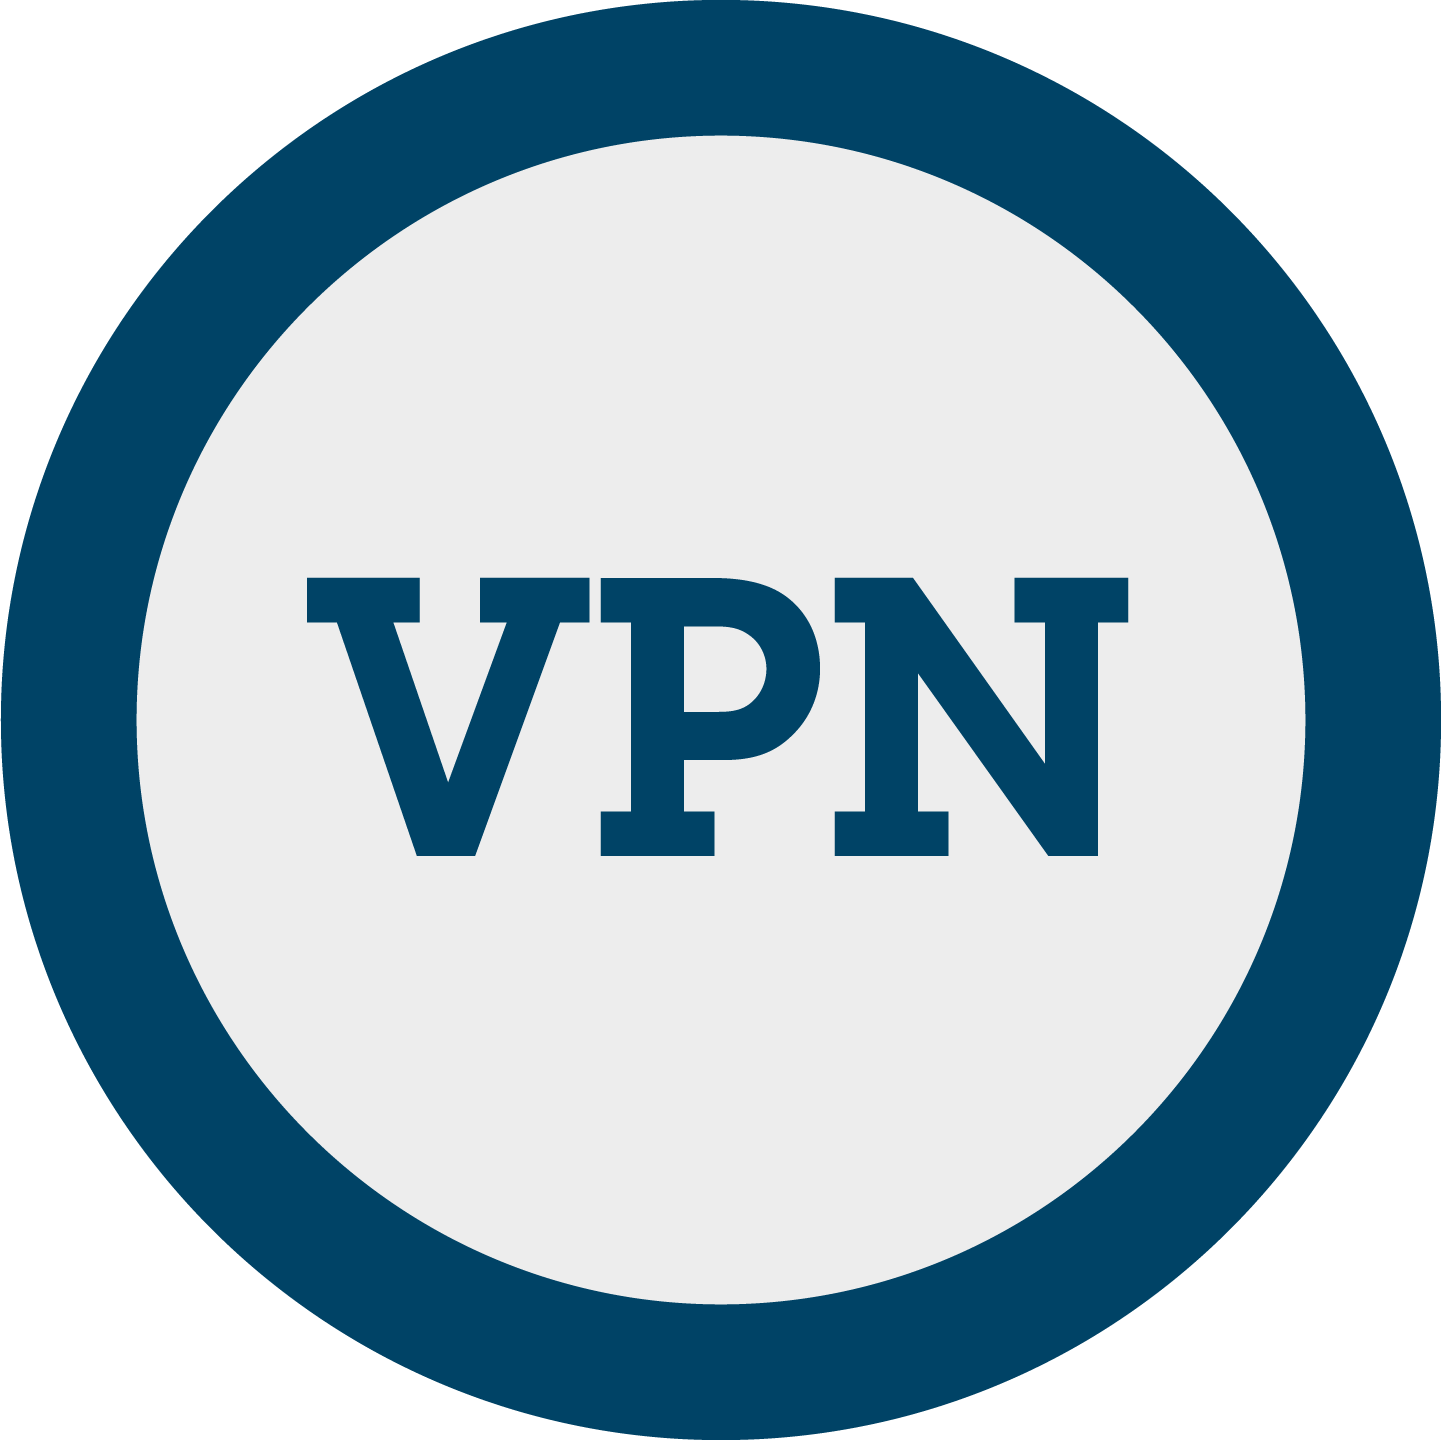 how to make a gui based vpn in vb.net